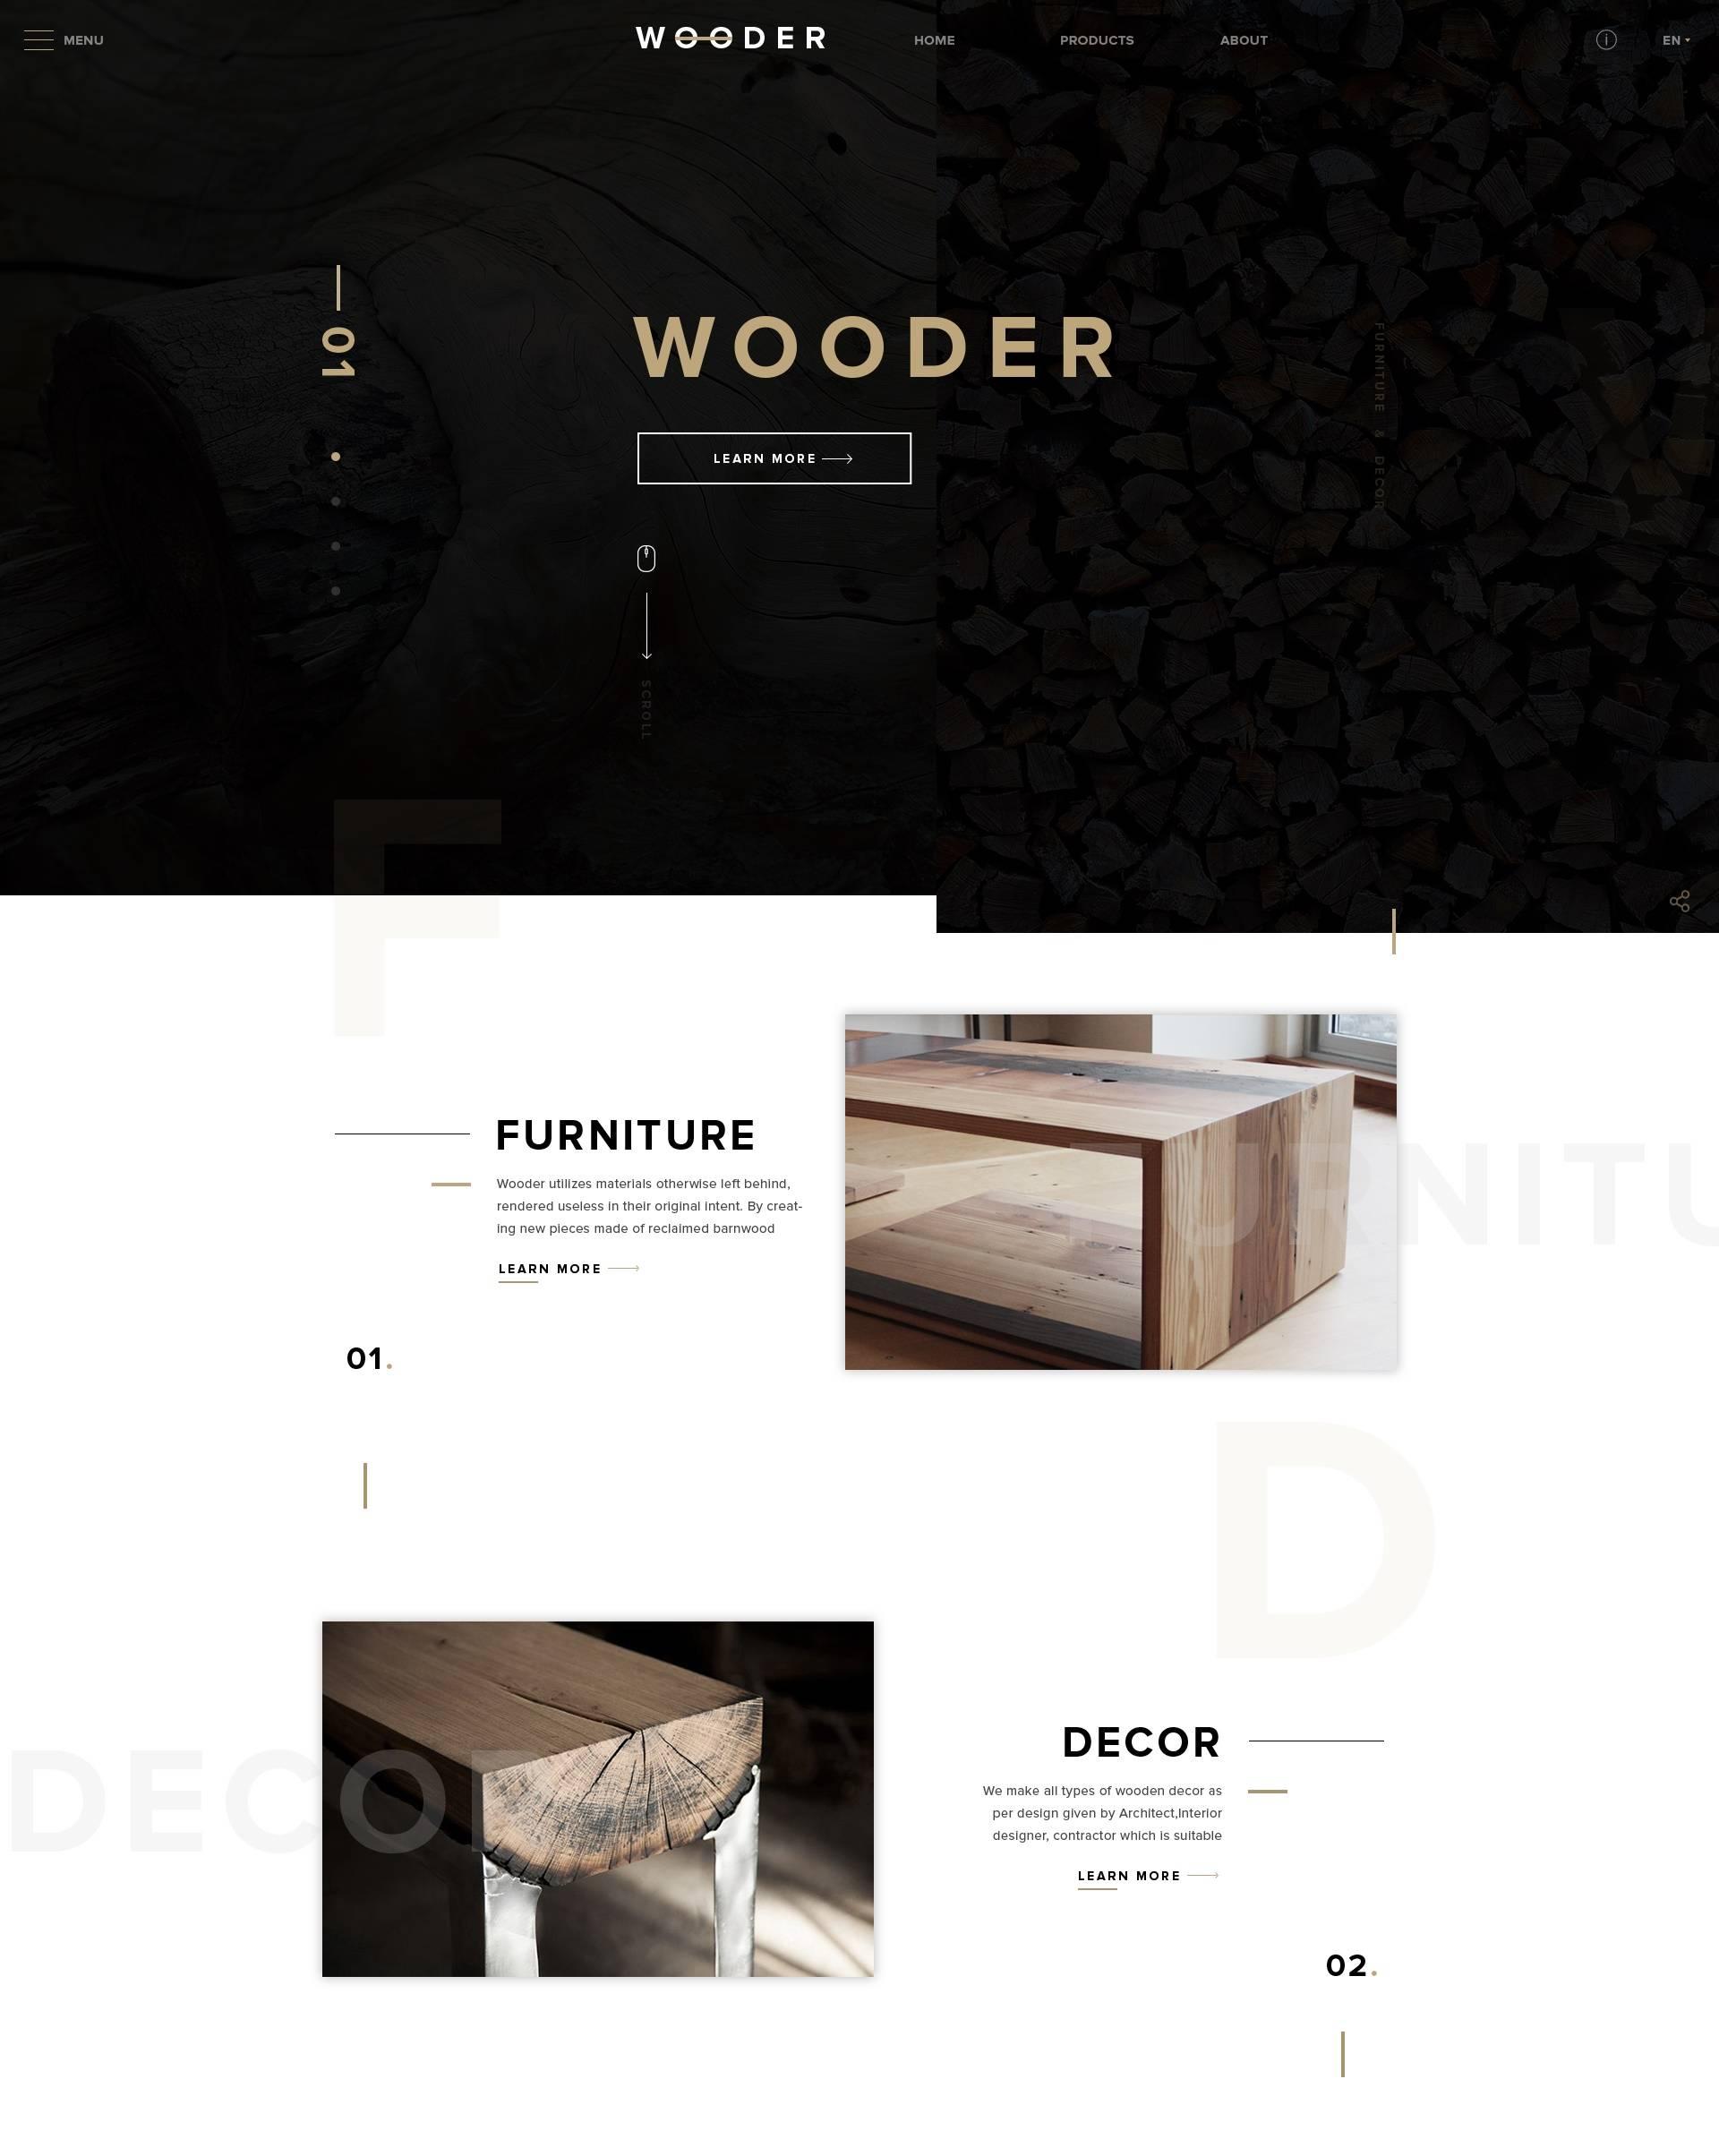 WOODER- free templates download for website